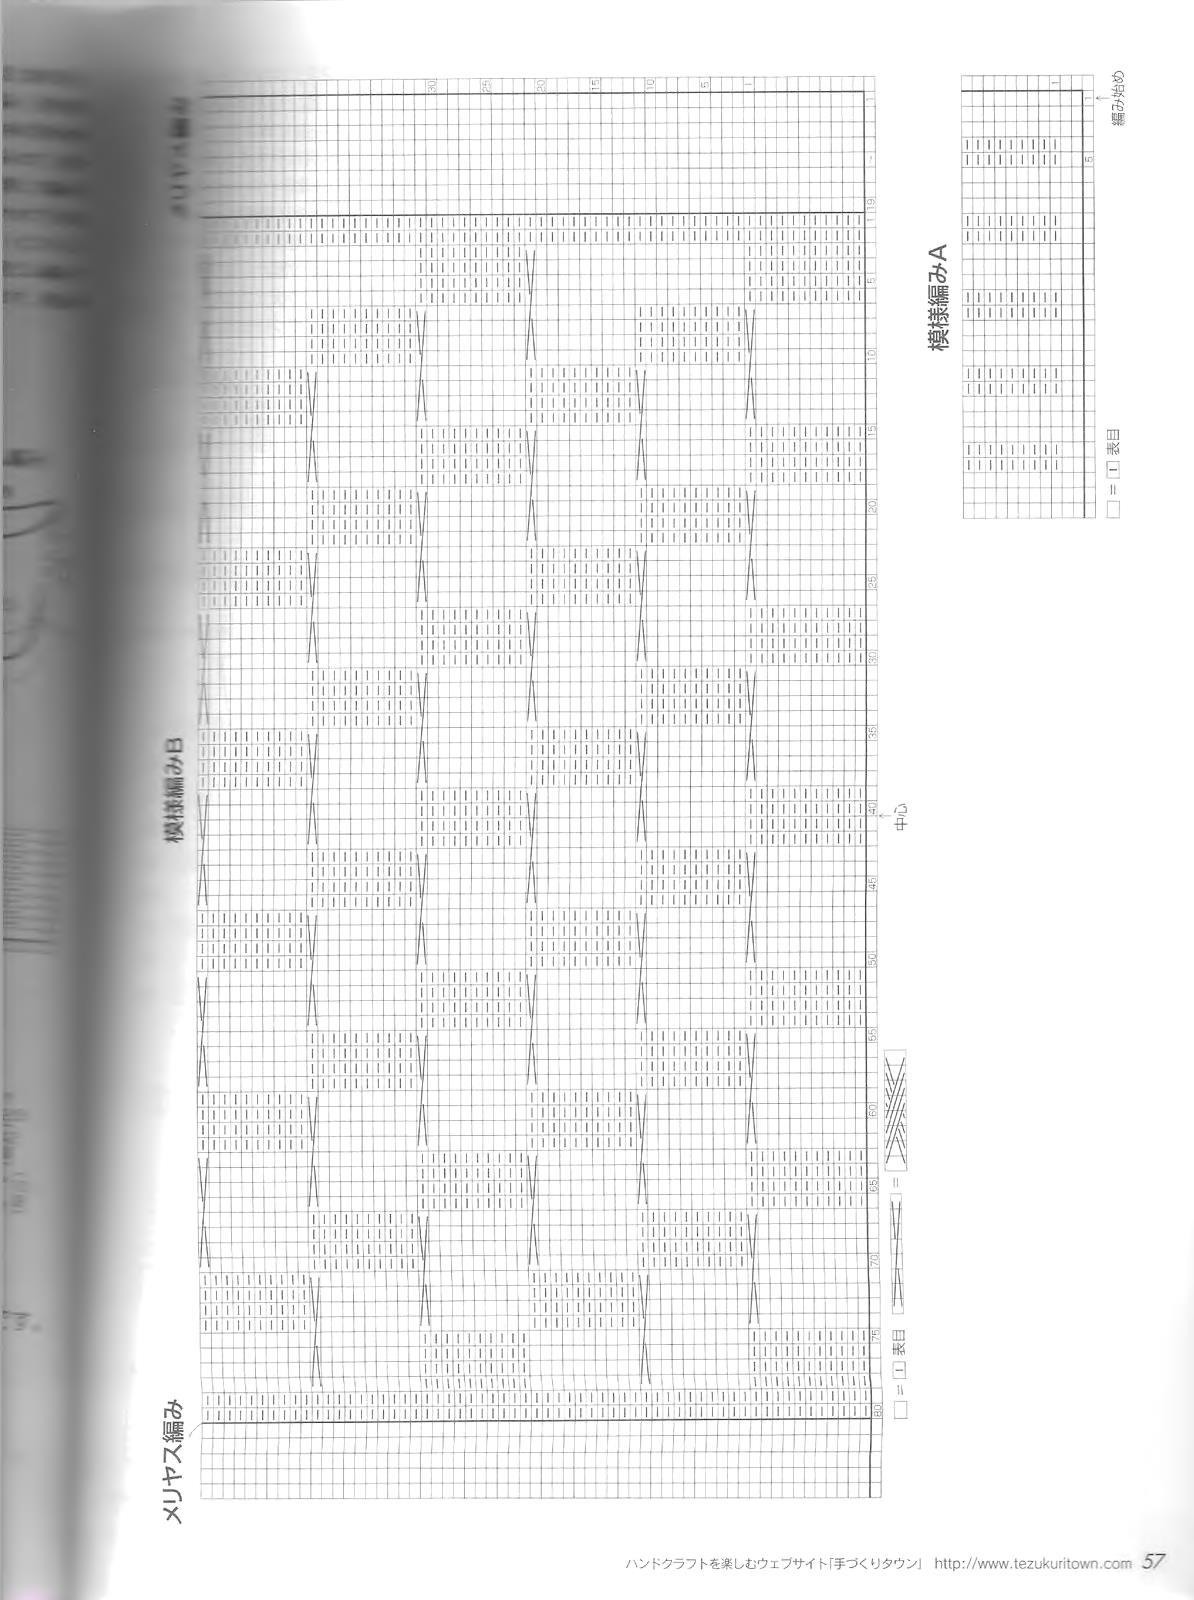 Let's knit series NV4375 2008 M-L sp-kr_57